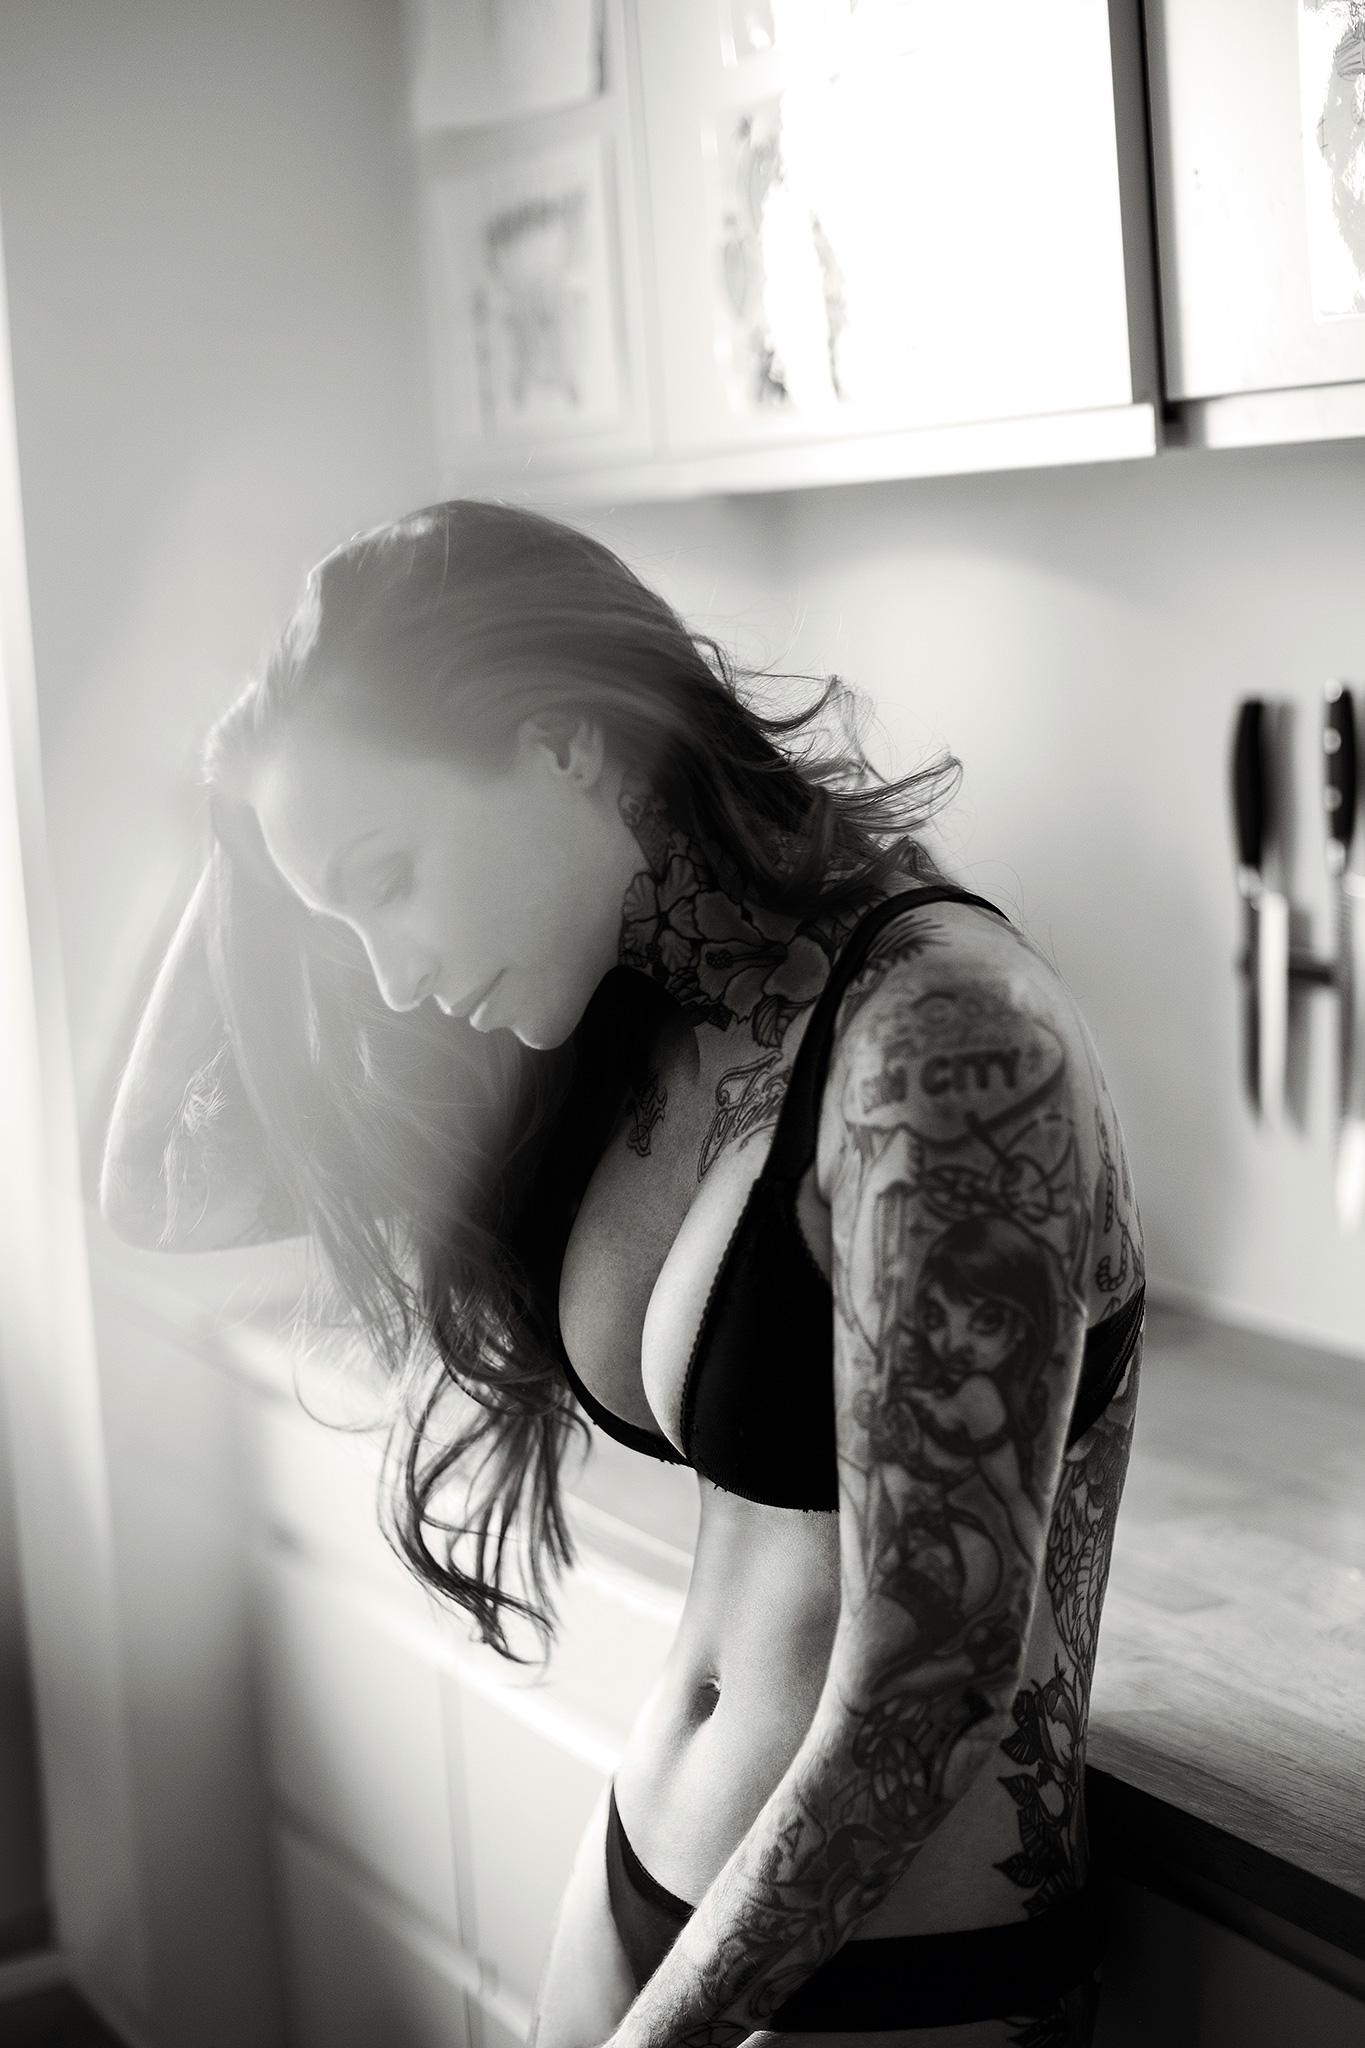 Mikkel_Laumann_Photography_Anne_Lindfjeld_Reroute_To_Remain_Photoshoot_Magazine_07.jpg